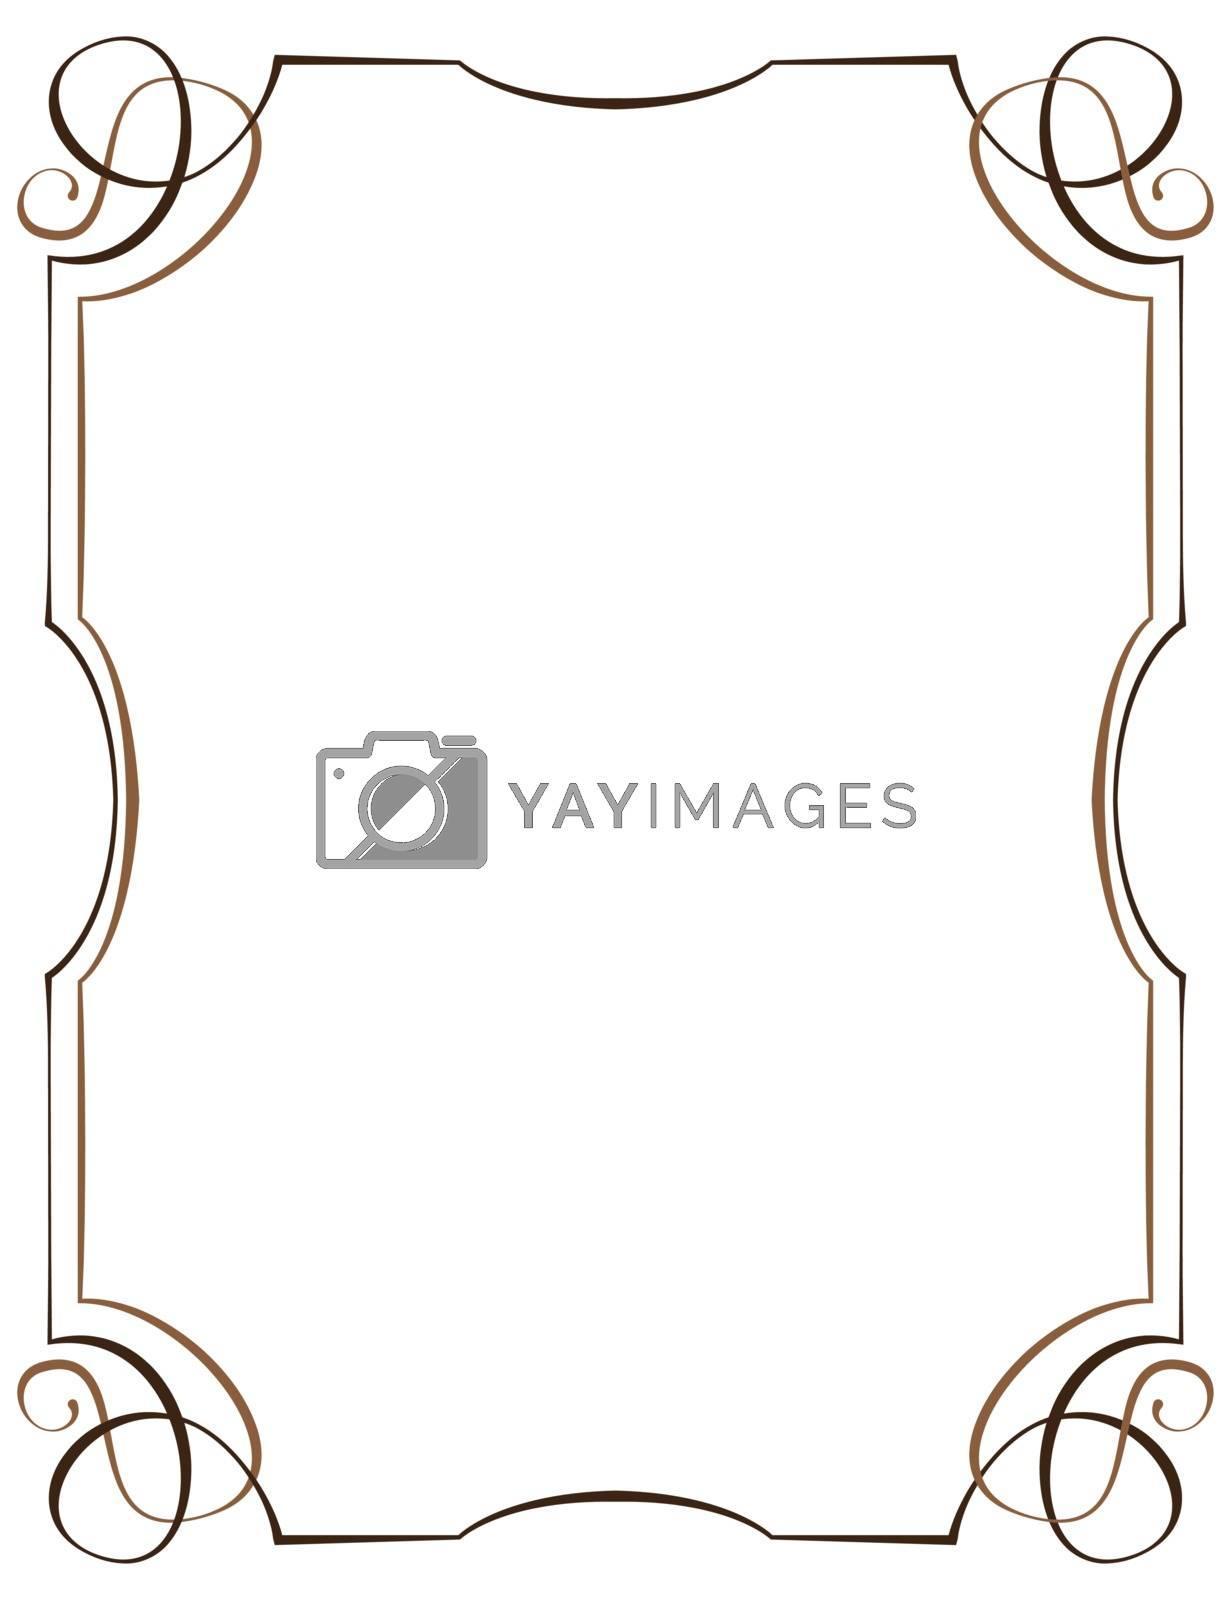 Vintage multilayer vertical vector frame with swirls